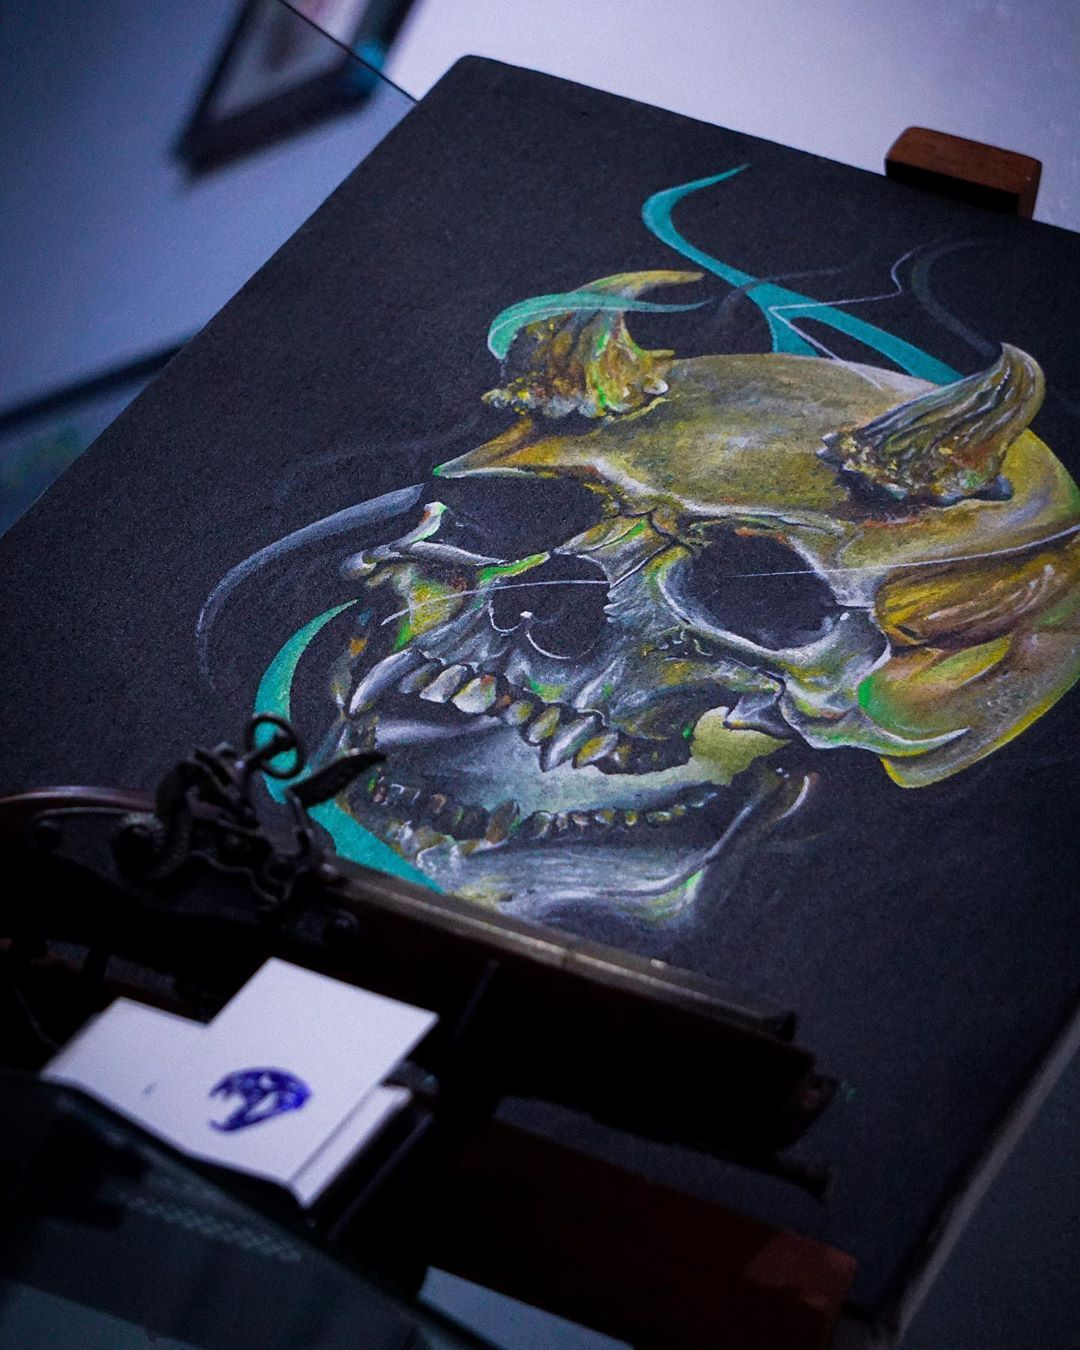 #lifestyle en @elementstattoos • • • #art #artstudio #painting #acrilicpainting #skull #tattoostyle #tattoostudio #ınstagood #instamoment #ink #instaphoto #life4life #artlife #artist #arte #tattooart #tarapoto #tarapotocity #perutattoo